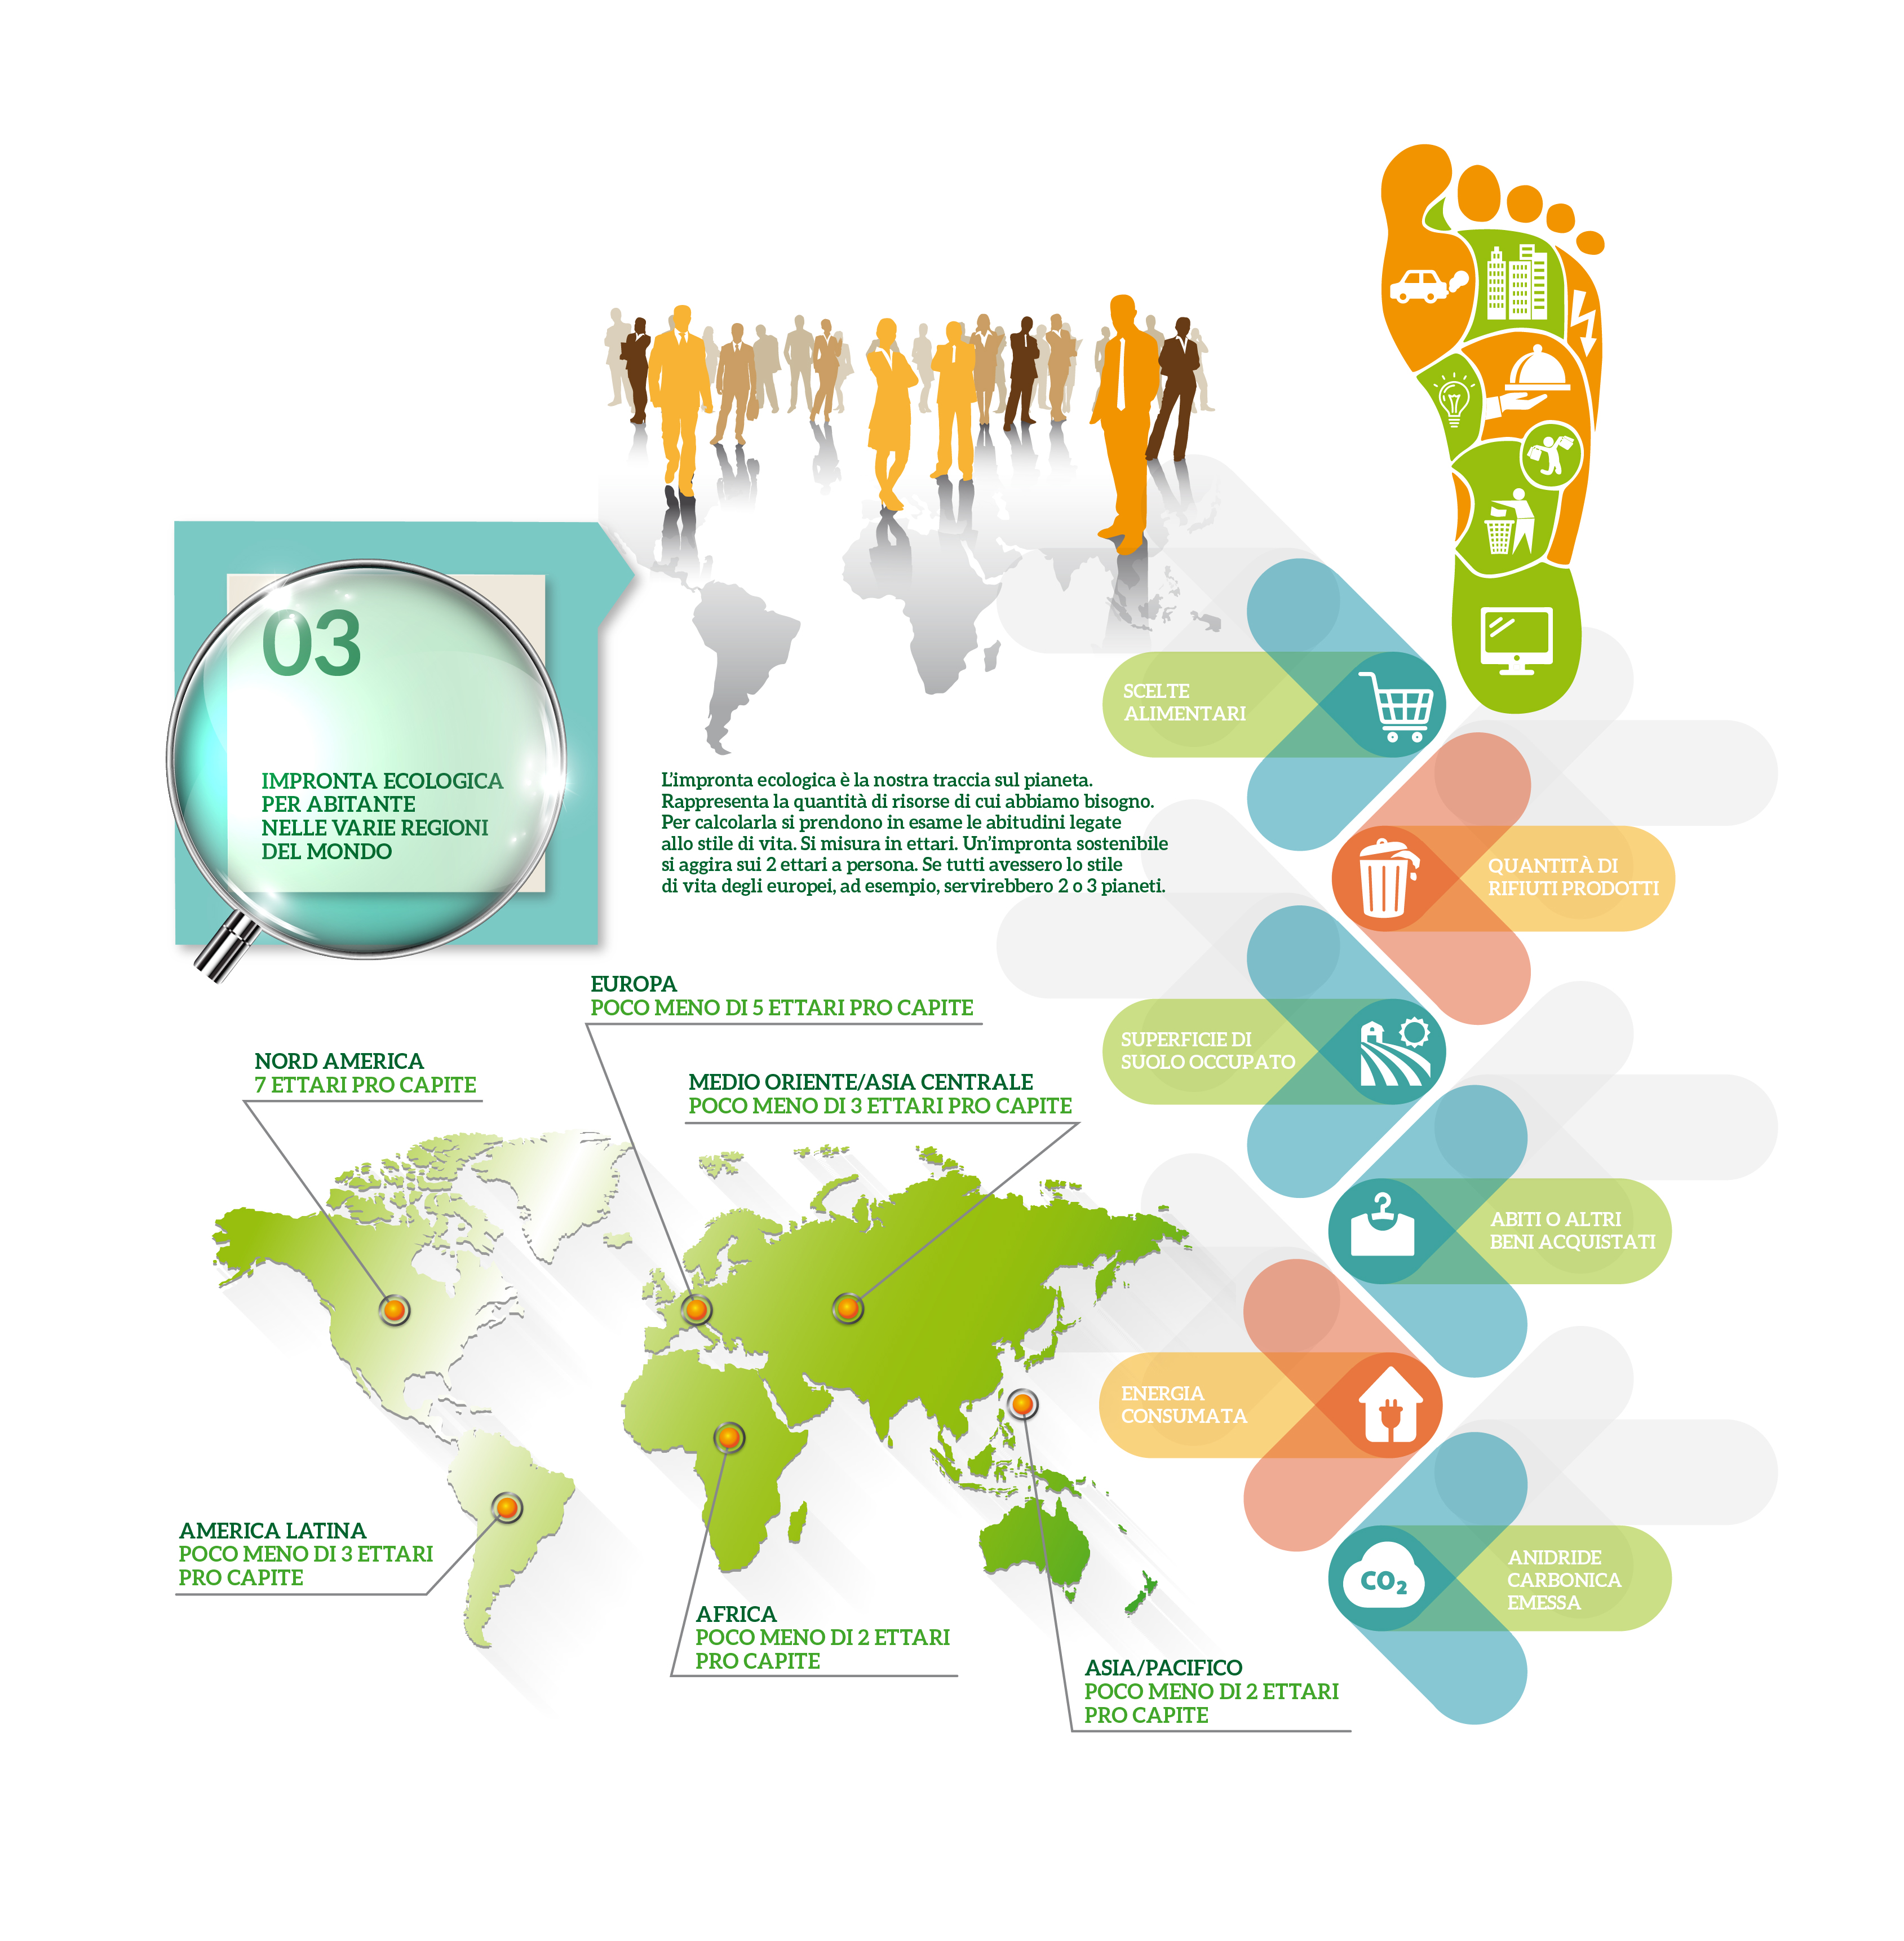 Impronta ecologica per abitanti nelle varie regioni del mondo